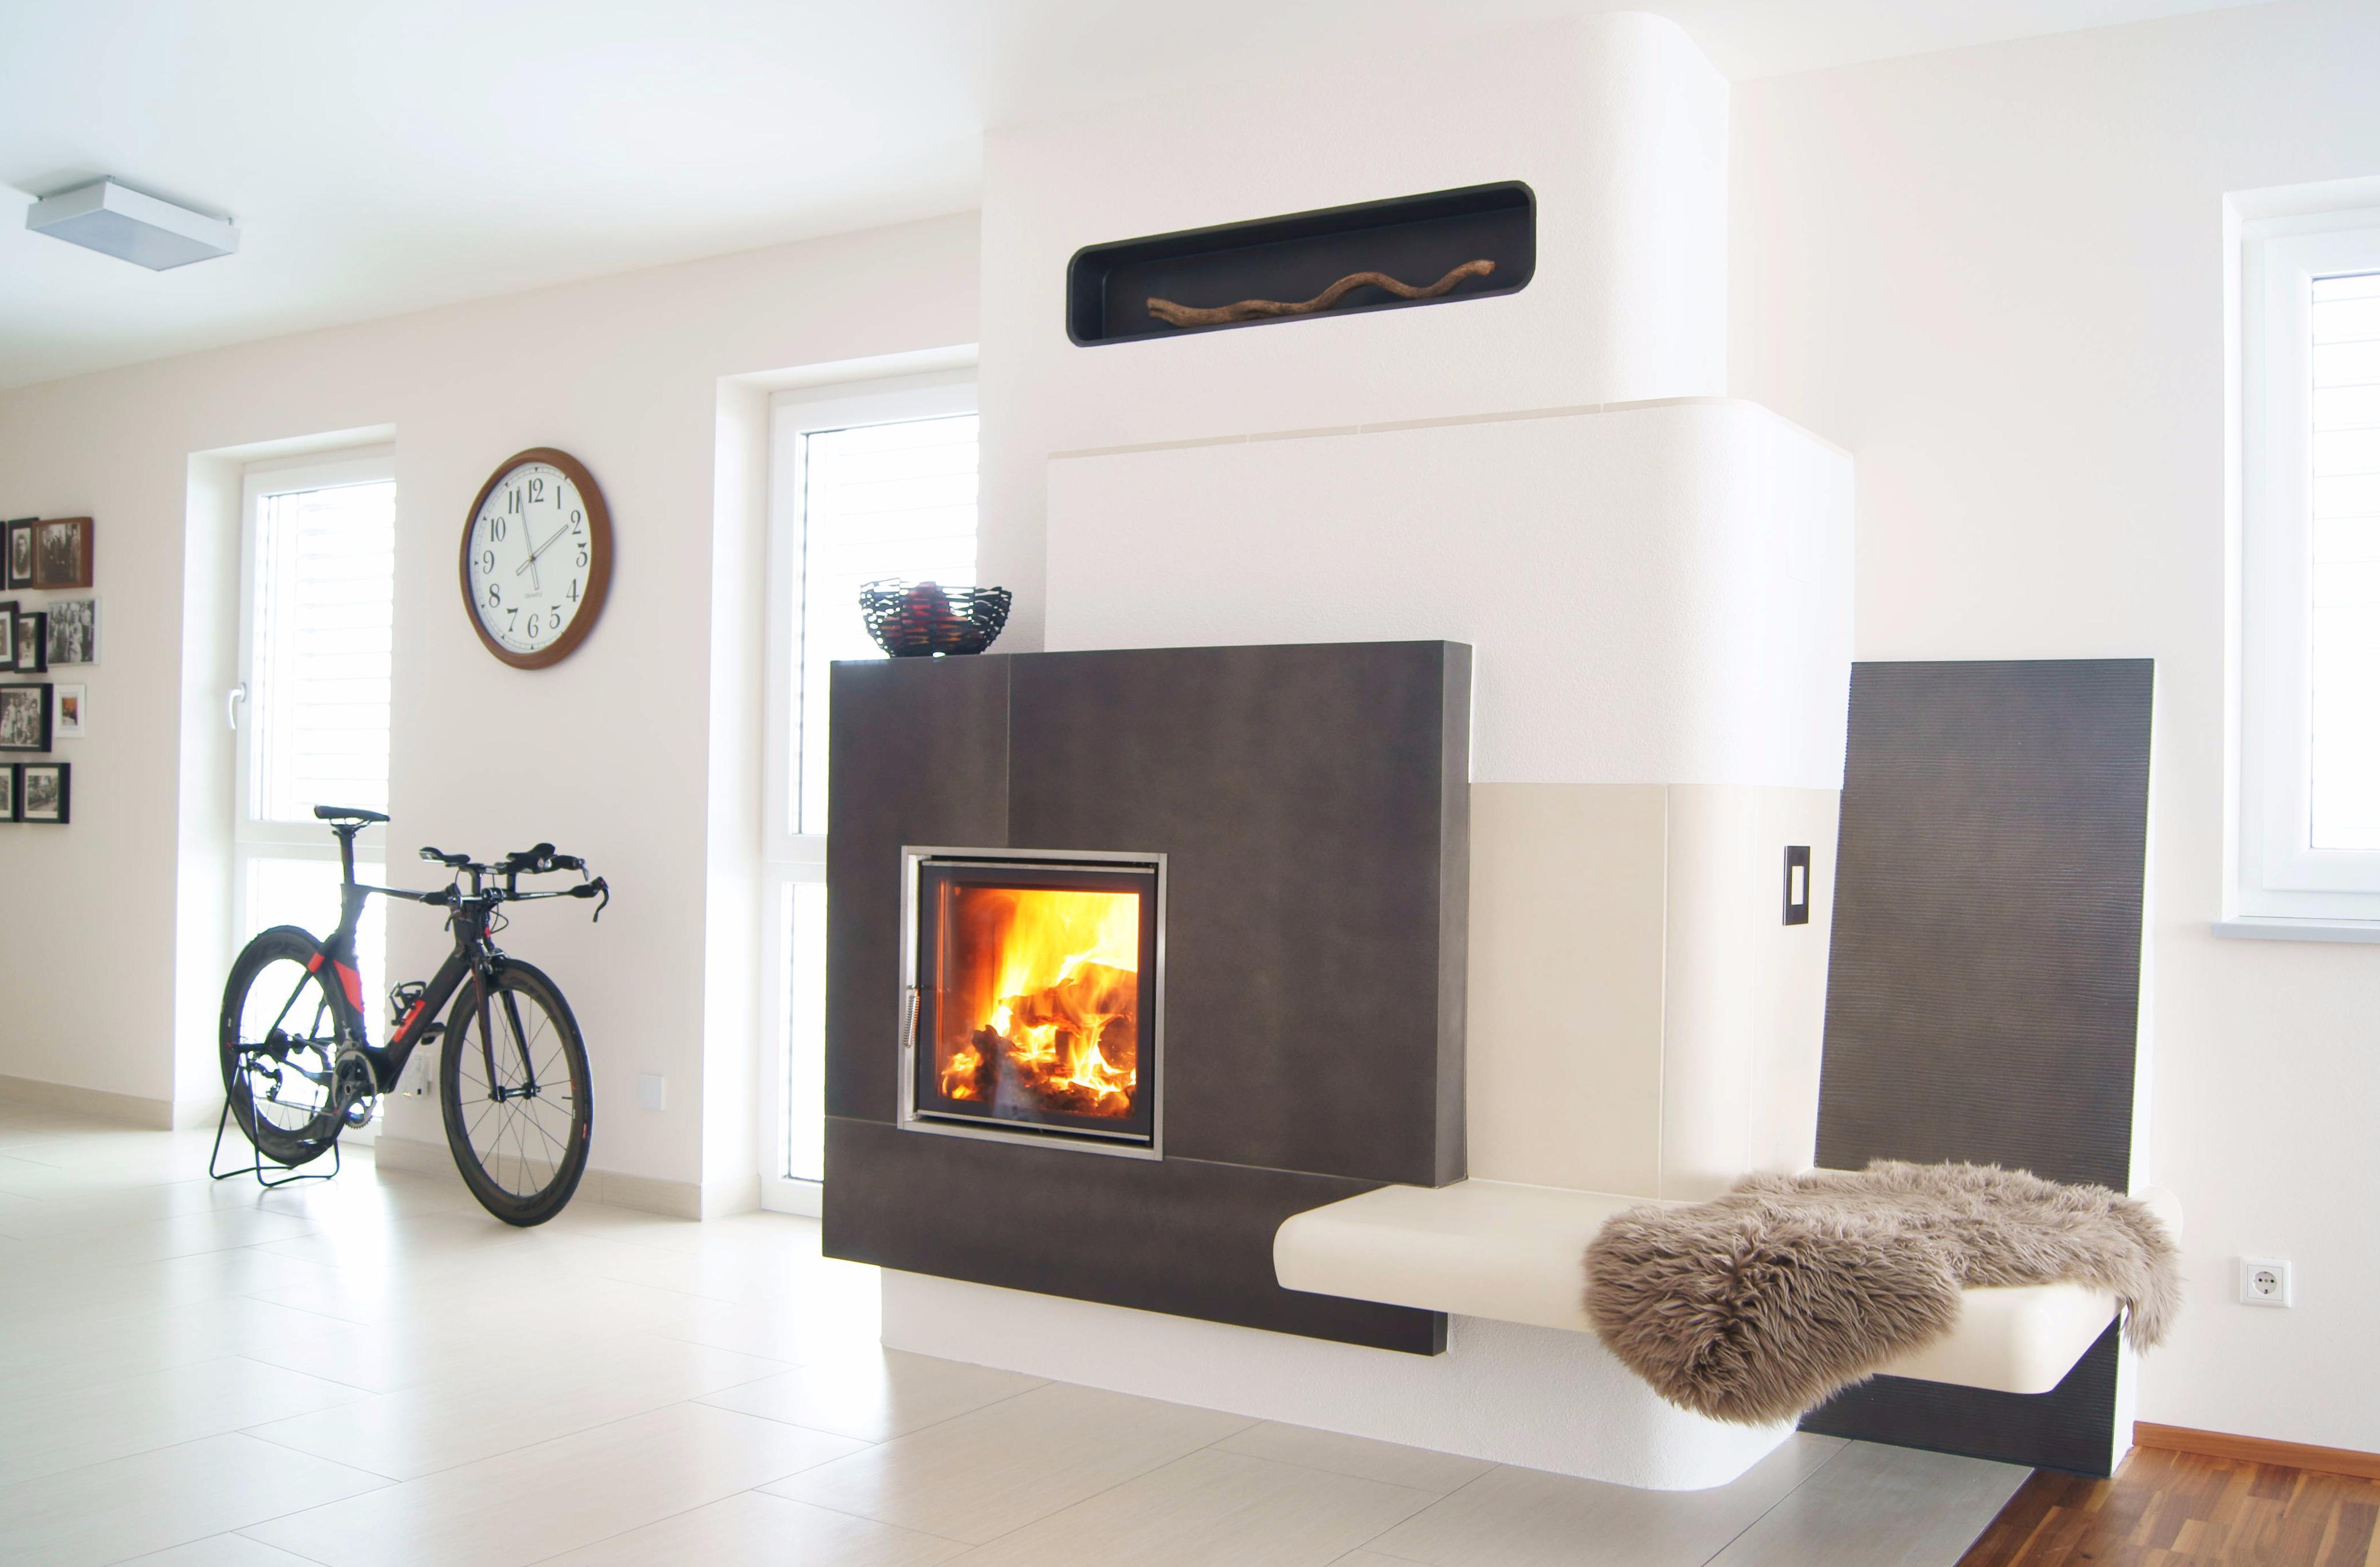 binder kachel fen fliesen elektrische haushaltsger te herstellung grosshandel markt. Black Bedroom Furniture Sets. Home Design Ideas